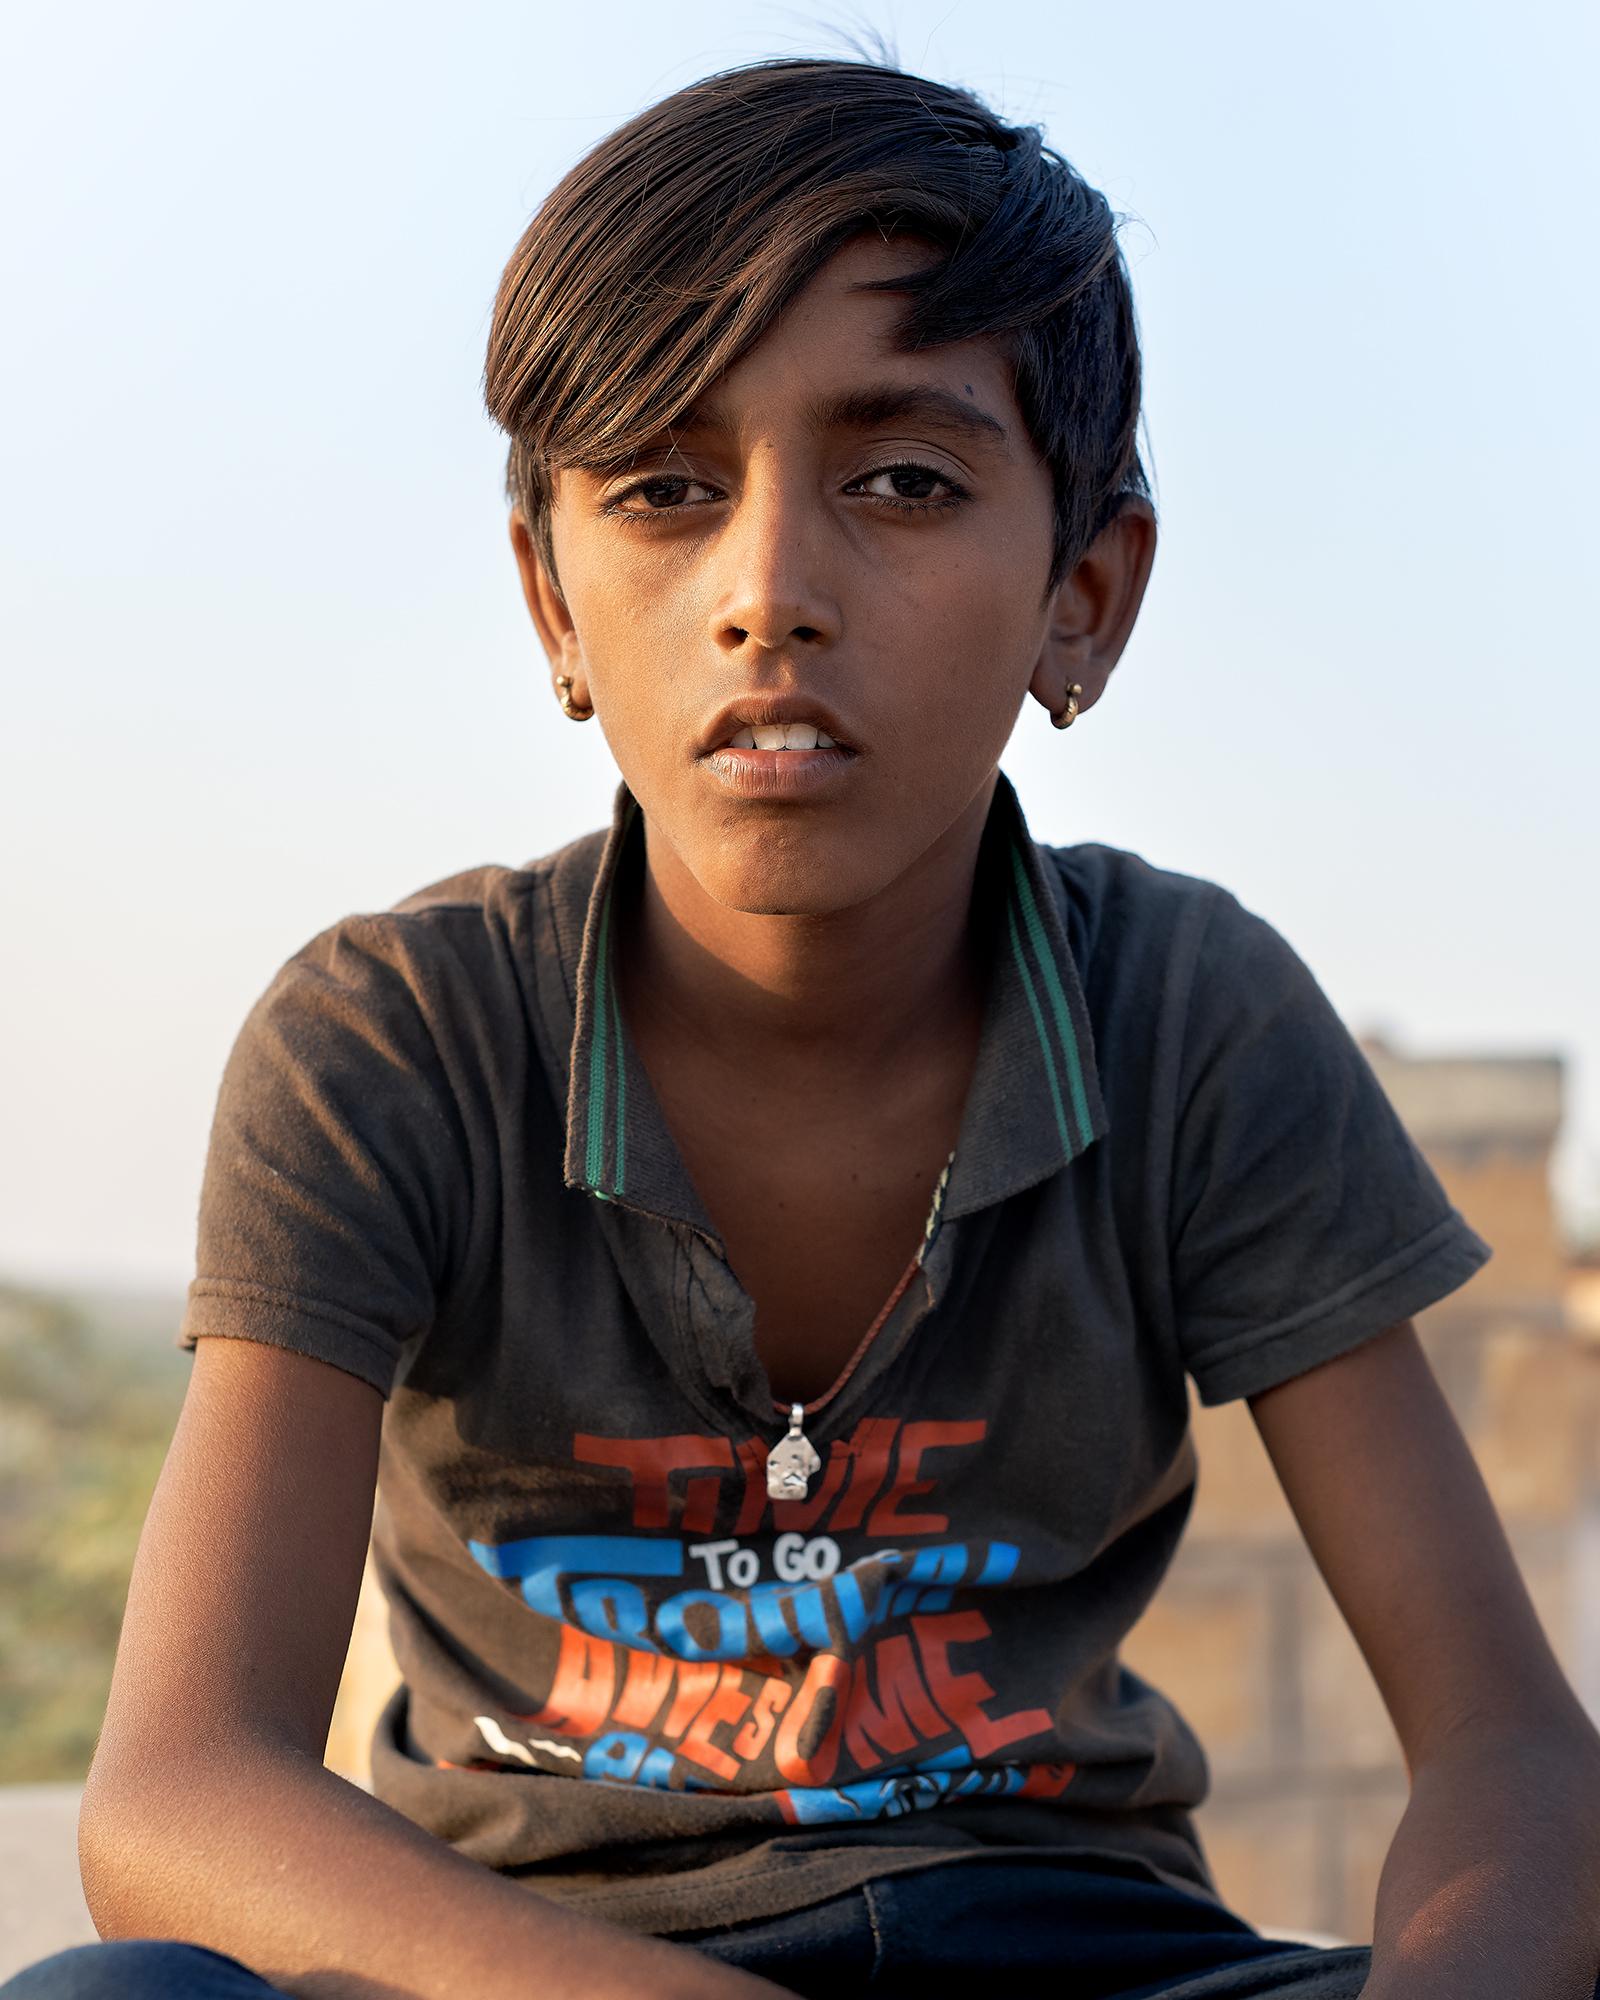 06_Jasuka, Jaisalmer, India, 2017.jpg